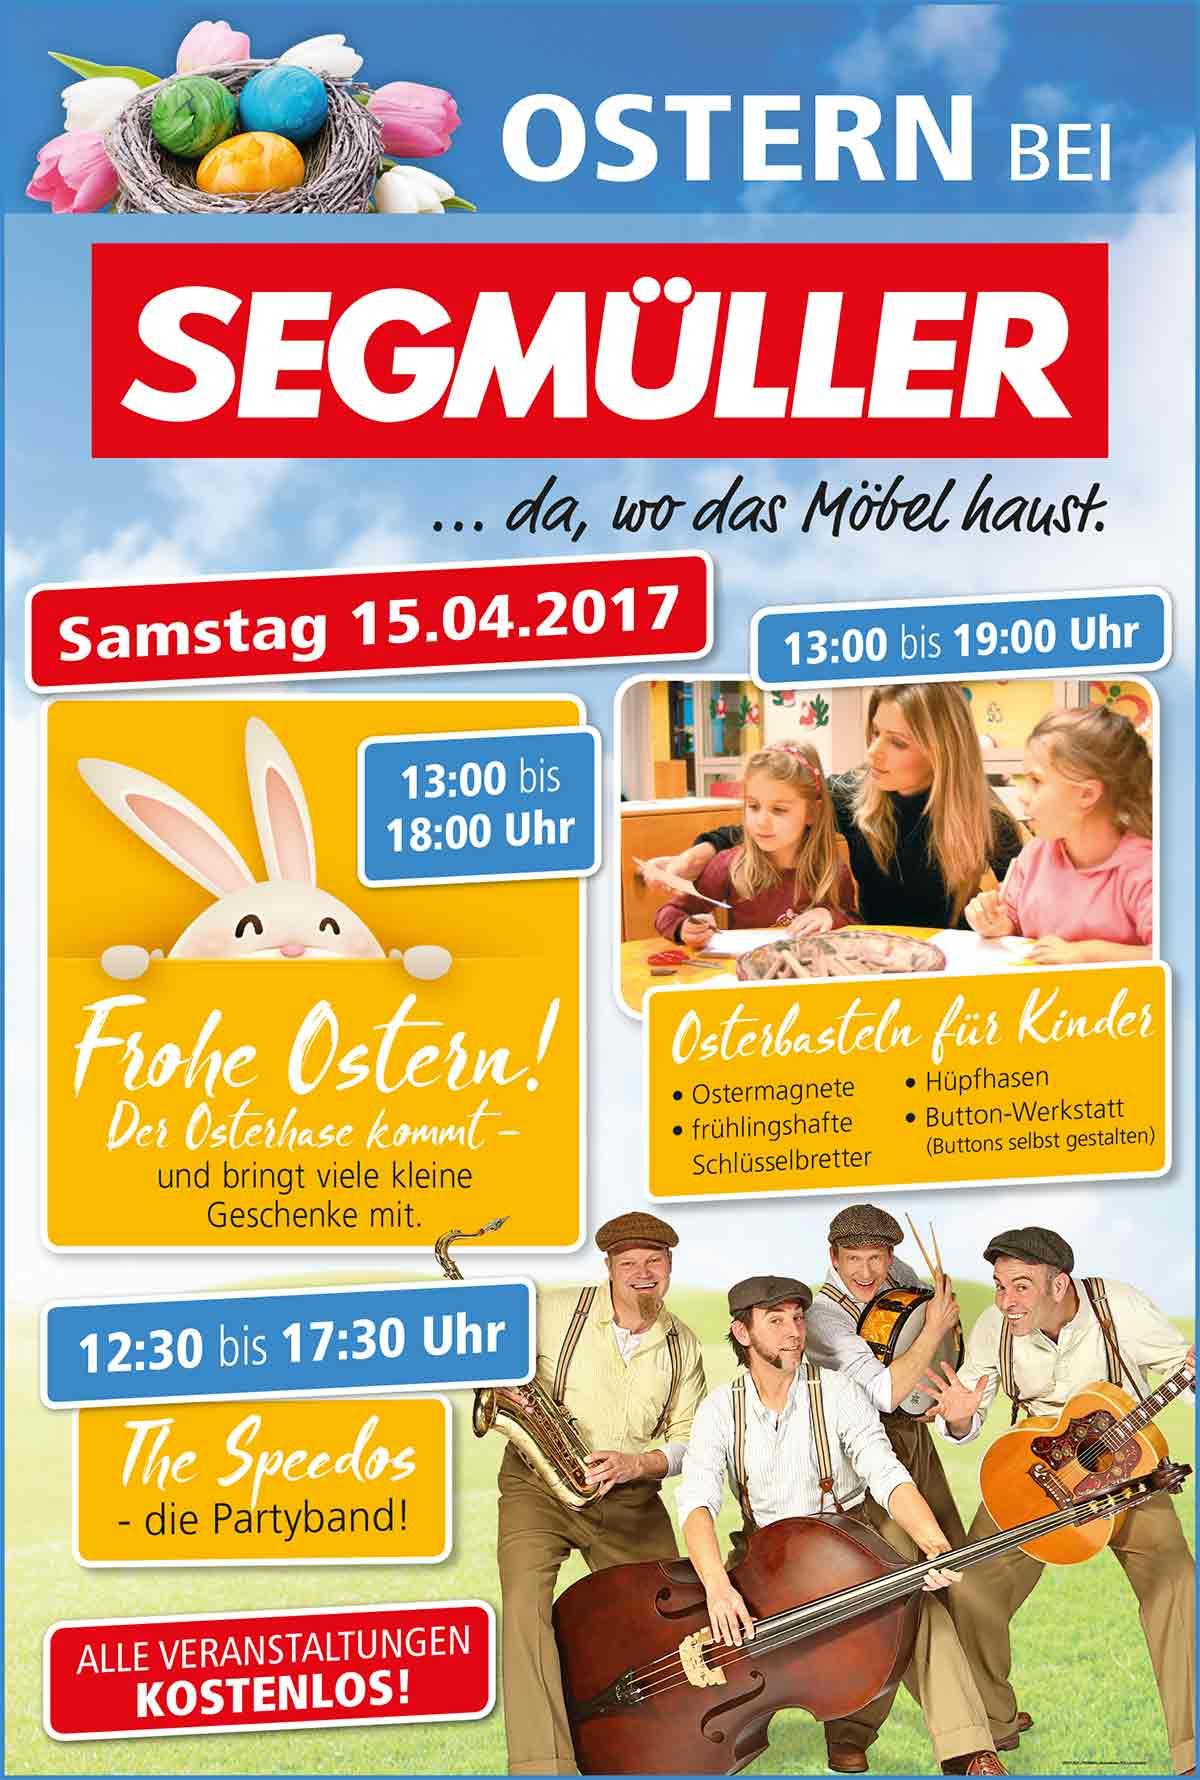 Raum208_Segmueller_Plakat_Ostern_Design